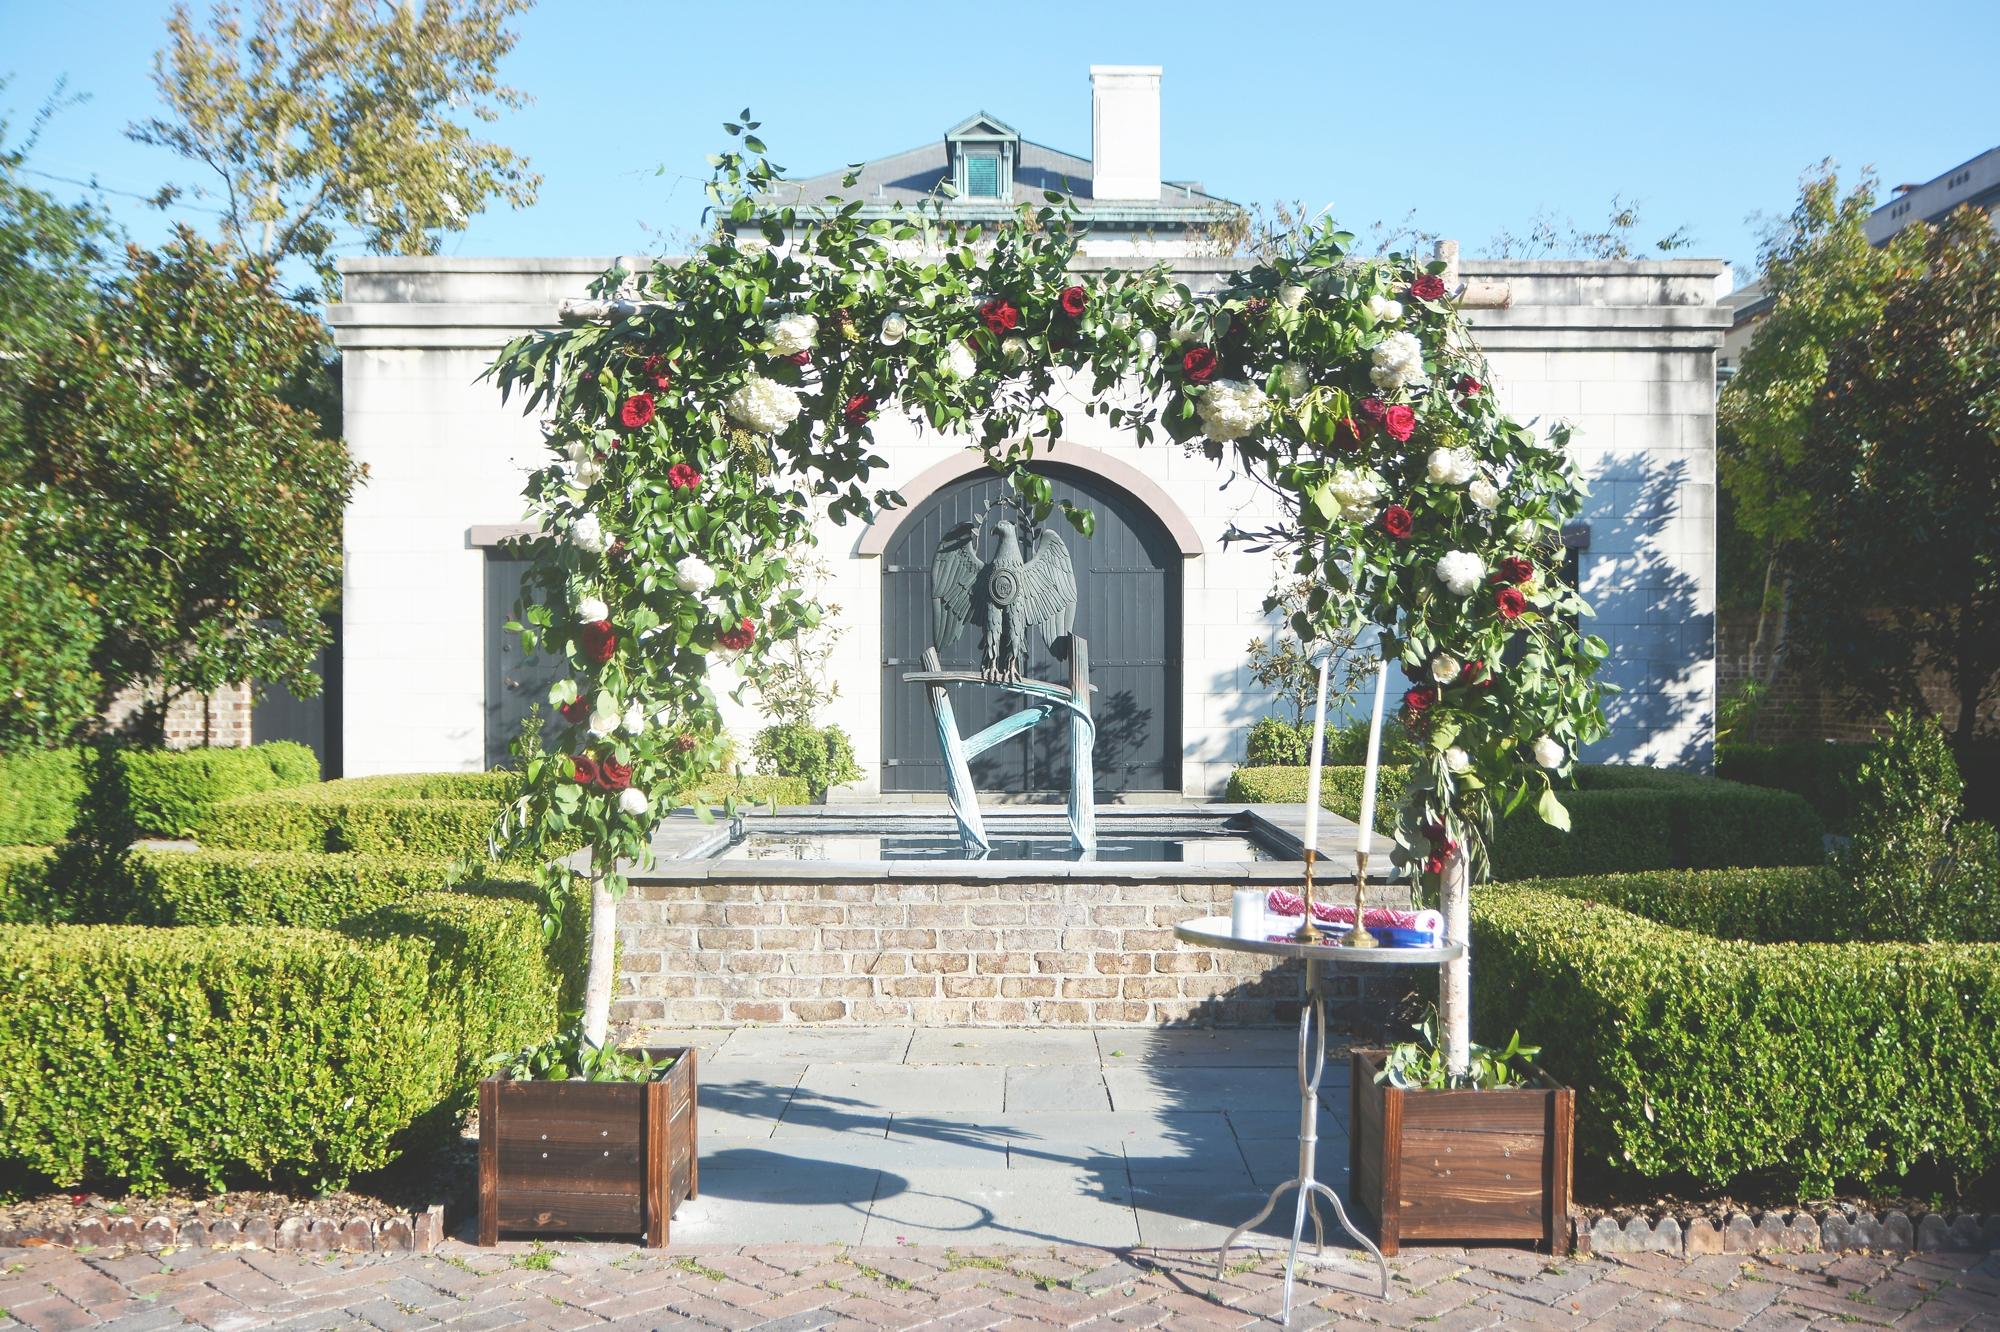 savannah-ga-harper-fowlkes-house-soho-south-cafe-wedding-six-hearts-photography030